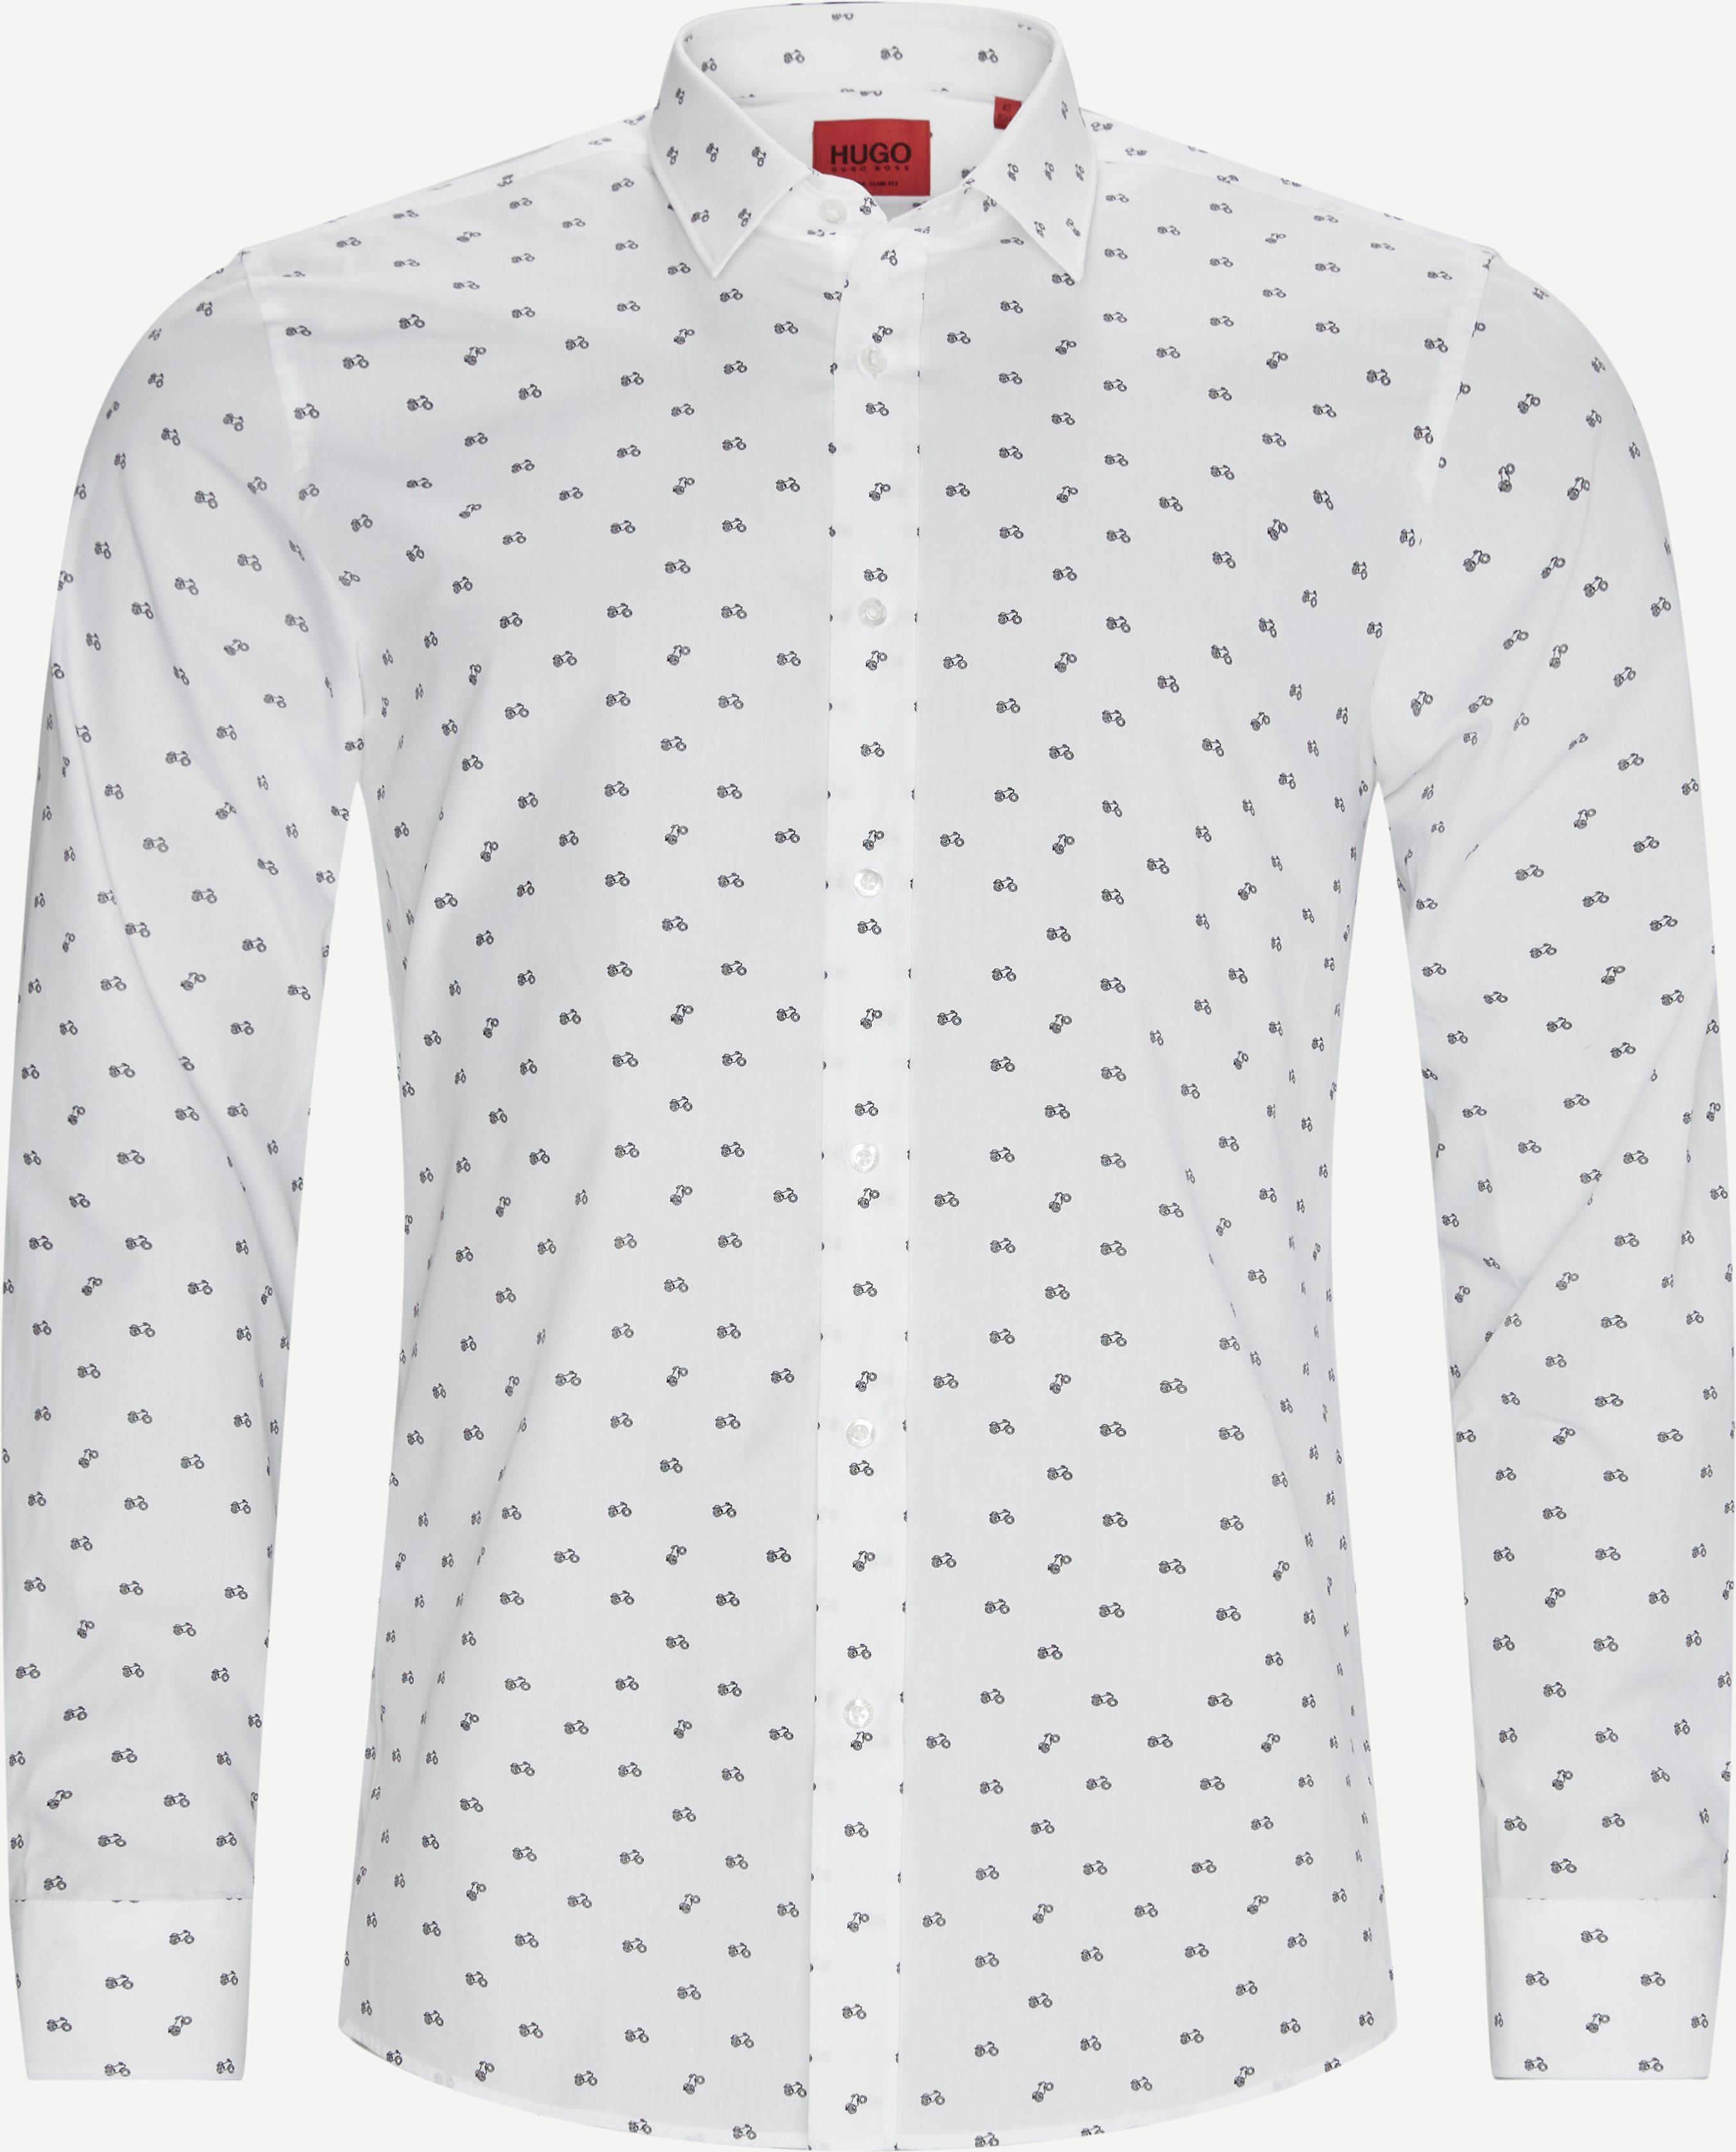 Elisha Skjorte - Skjortor - Slim fit - Vit